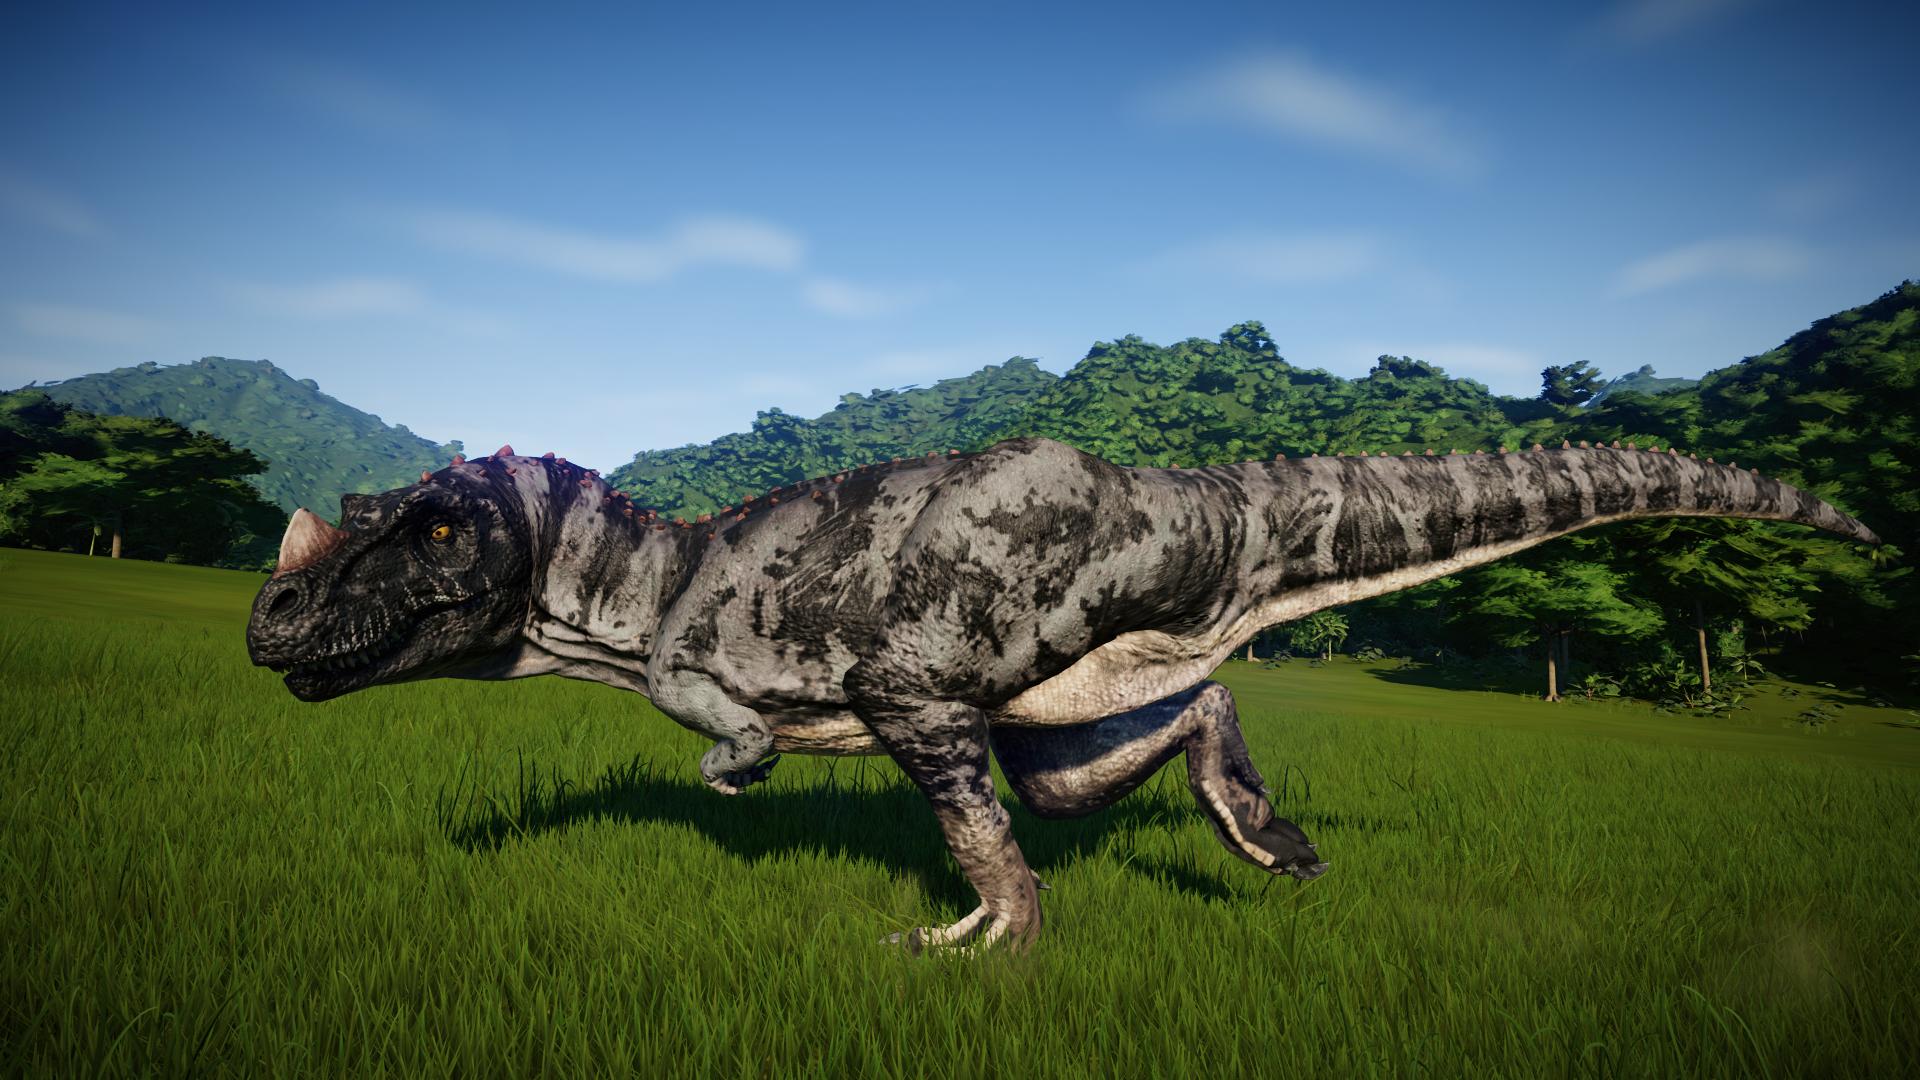 Ceratosaurus Jurassic Park World Jurassic World Jurassic Park Series